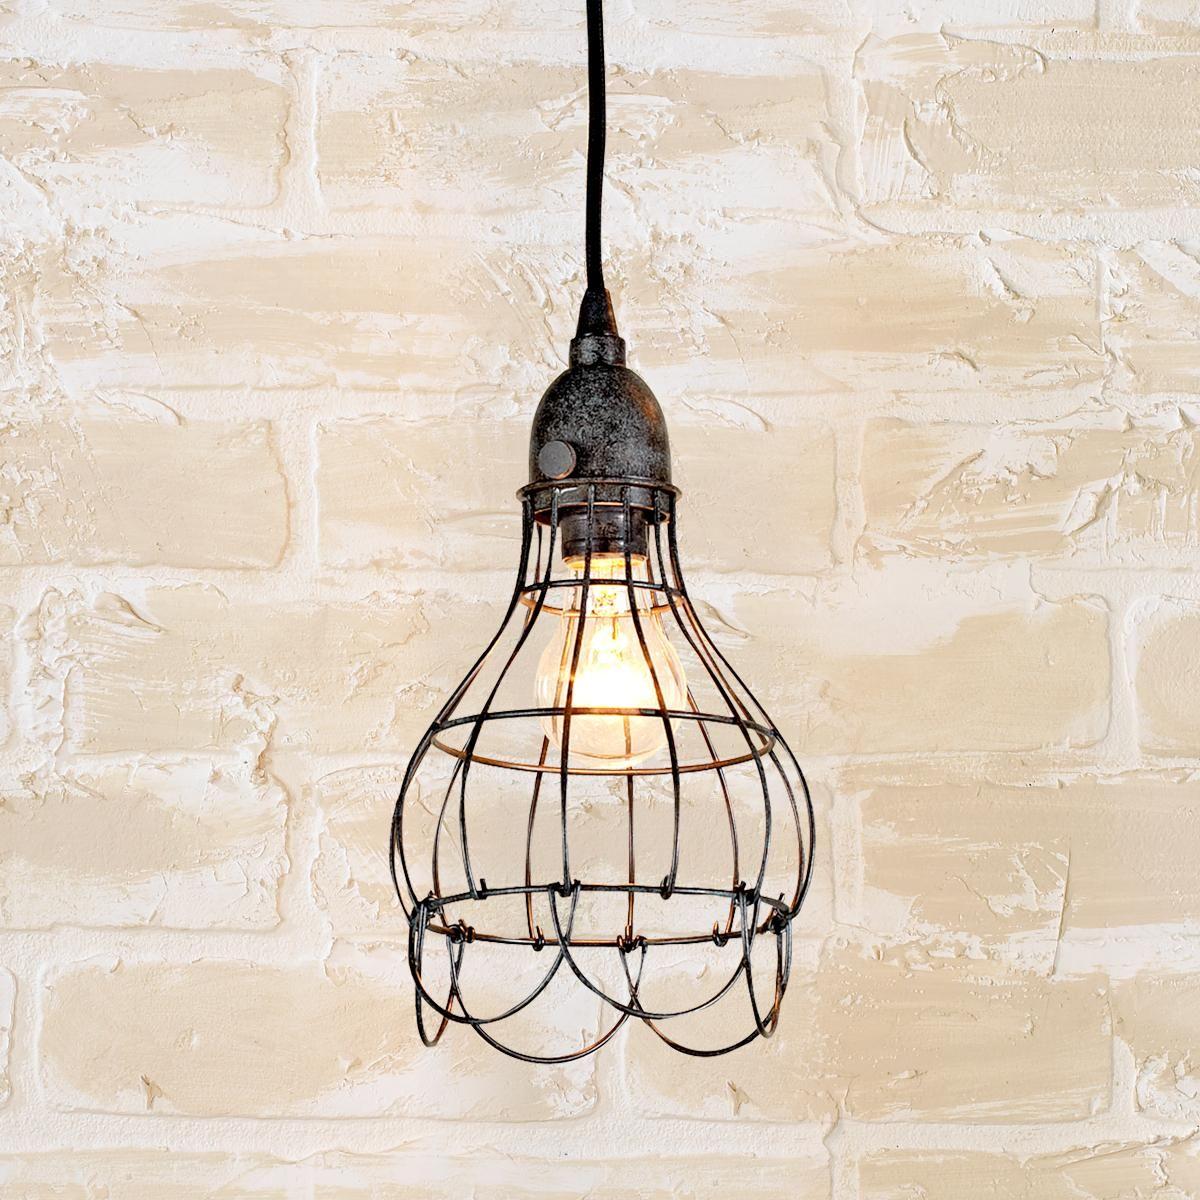 Industrial Cage Work Light Pendant Hanging Lamp Shade Antique Lamp Shades Farmhouse Pendant Lighting